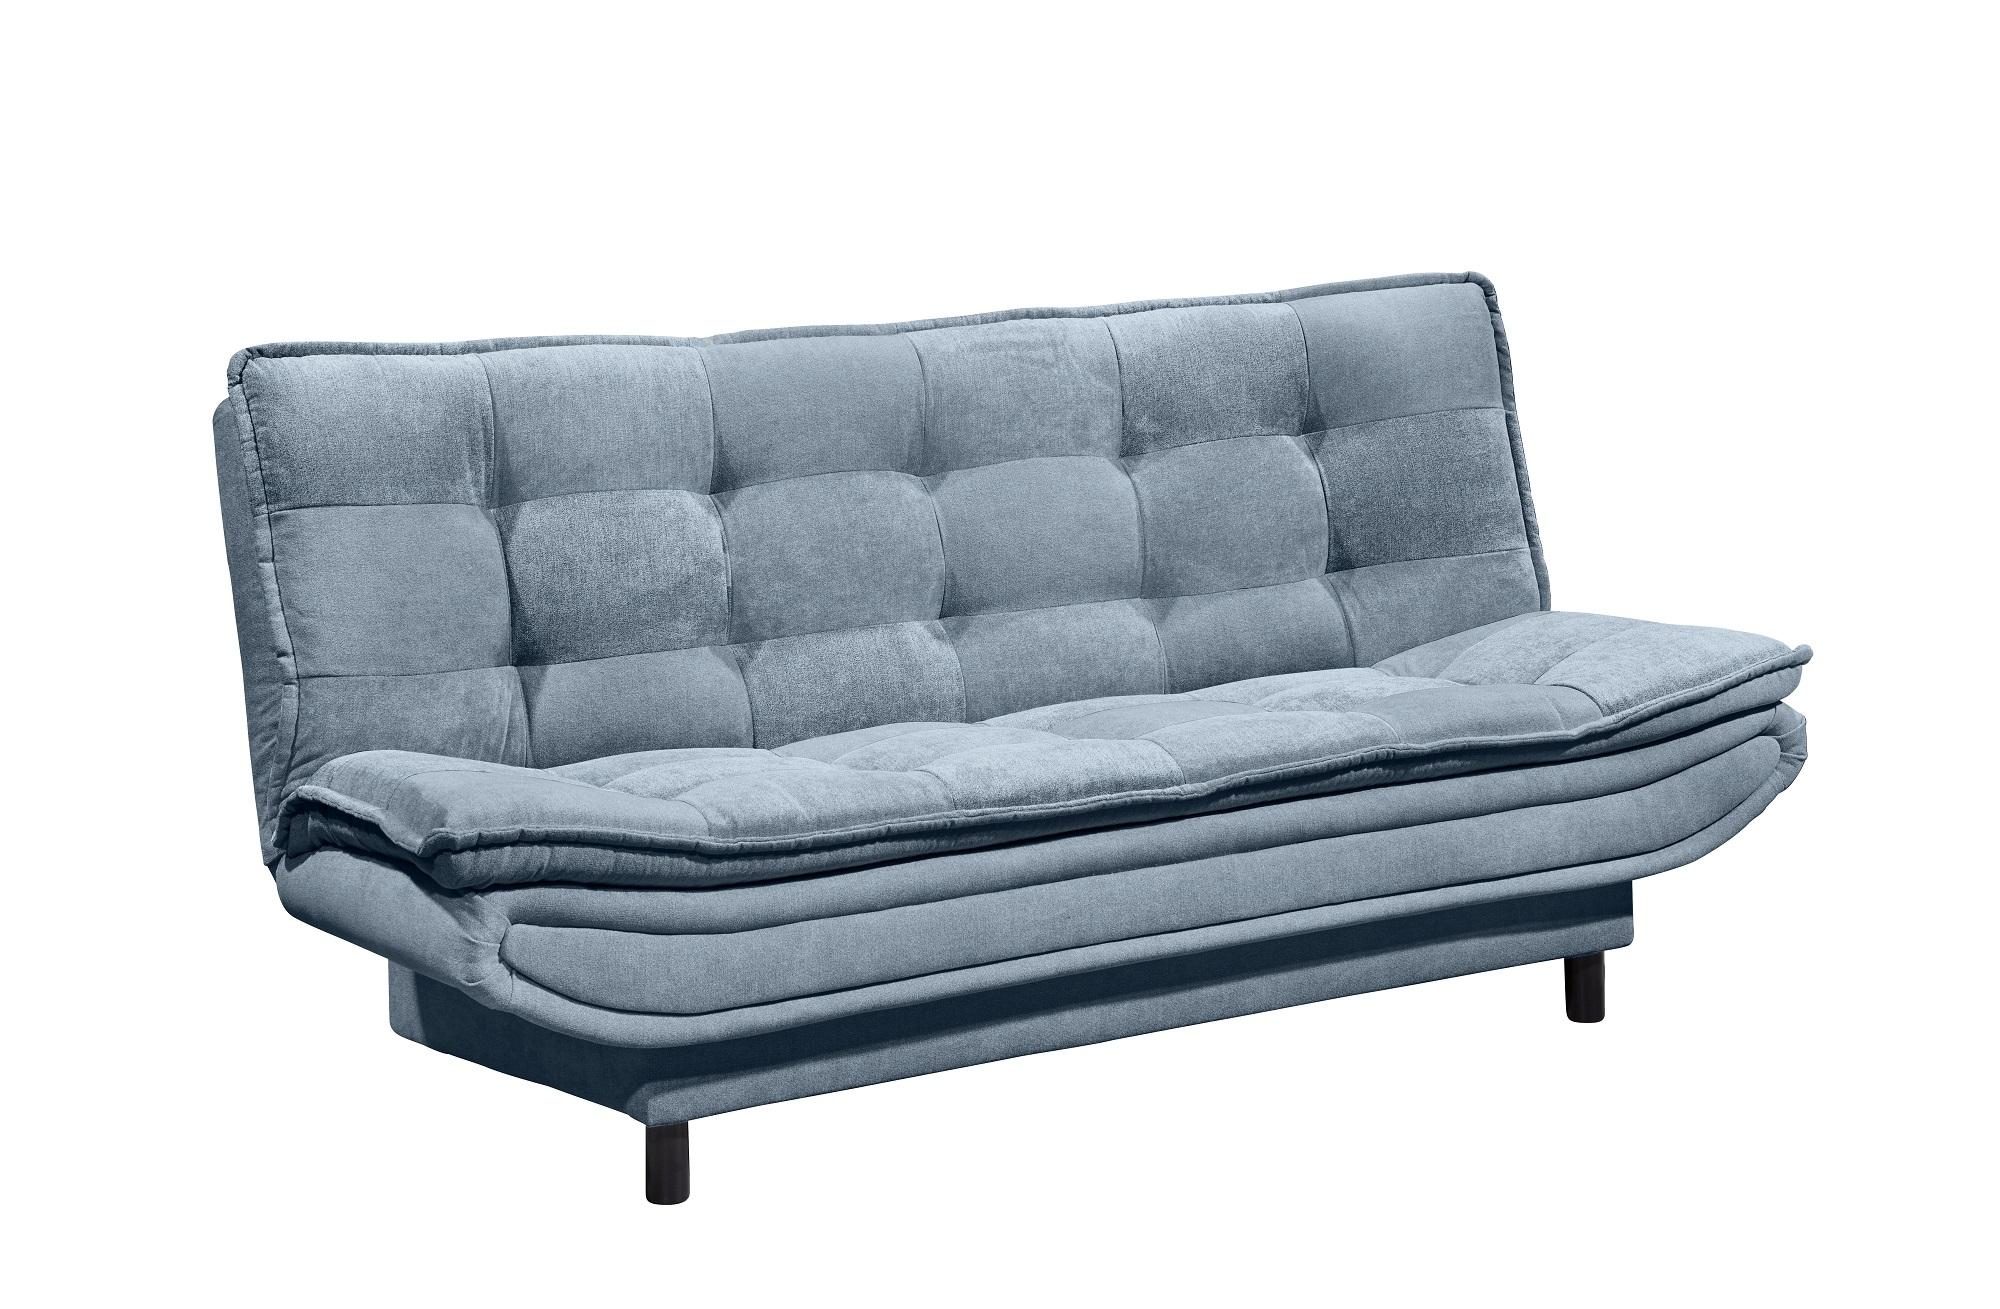 Canapea extensibila tapitata cu stofa, 3 locuri Patris Albastru, l188xA89xH90 cm somproduct.ro